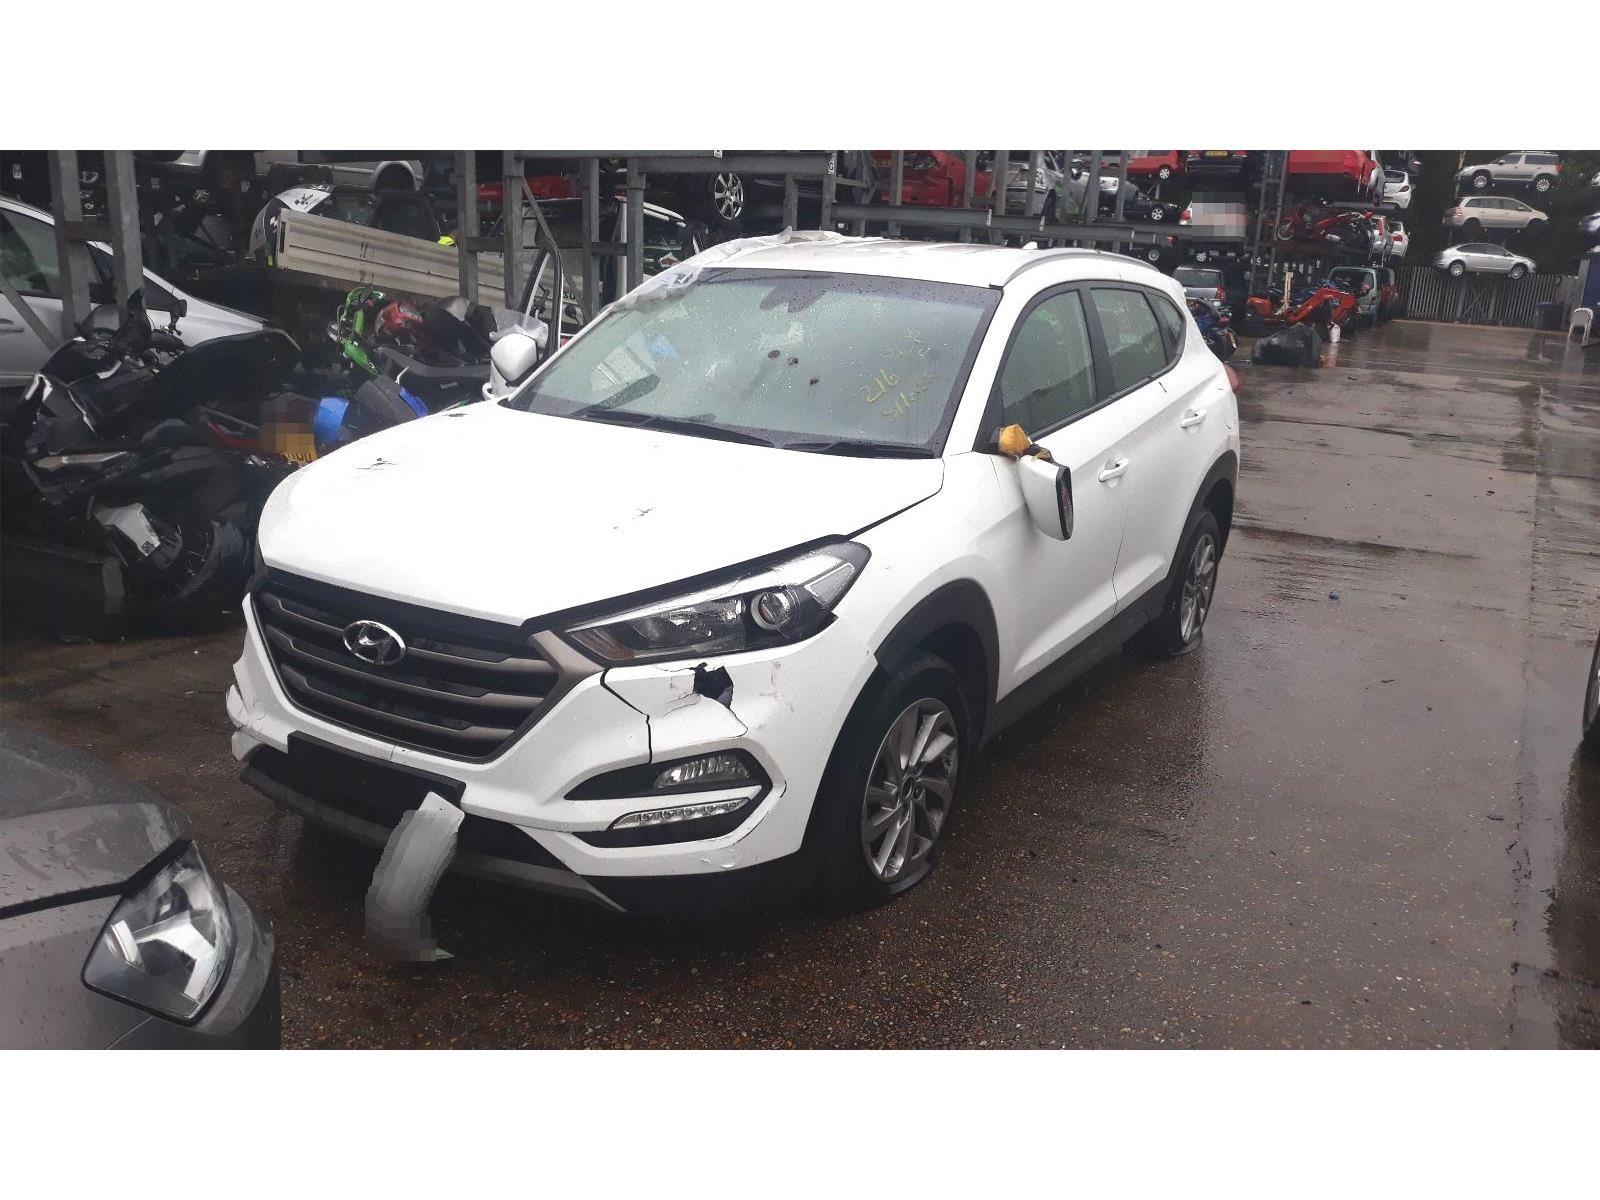 Hyundai Tucson 2015 On Se Nav Crdi 5 Door Suv Scrap Salvage Car For Sale Auction Silverlake Autoparts